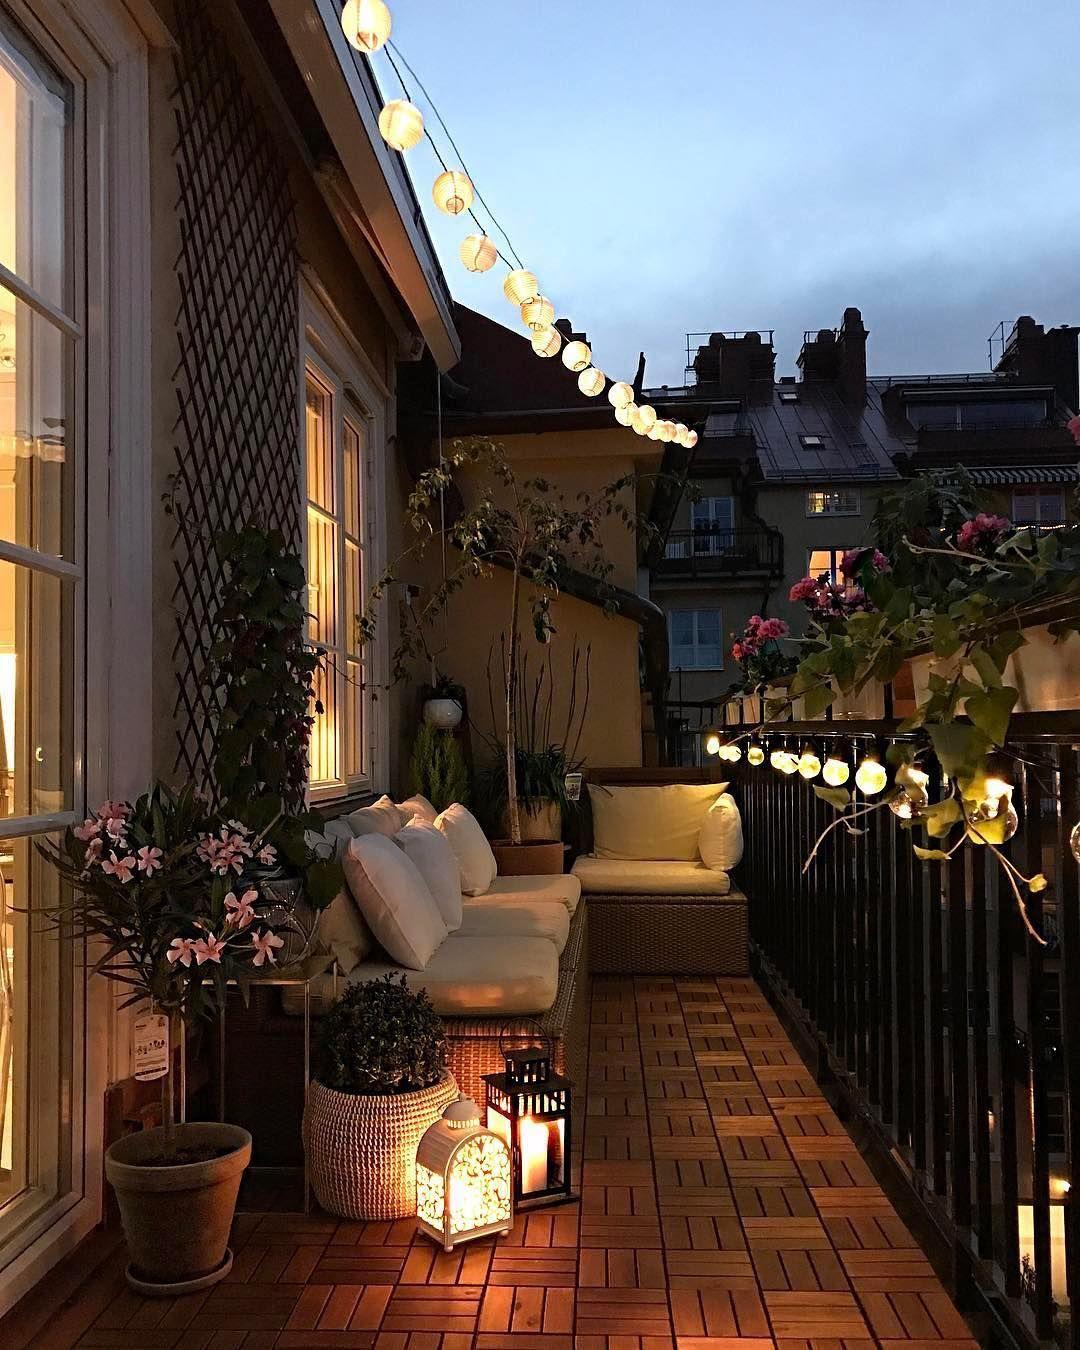 Apartment Balcony: @interior4inspo Op Instagram: 'So Cozy Credit